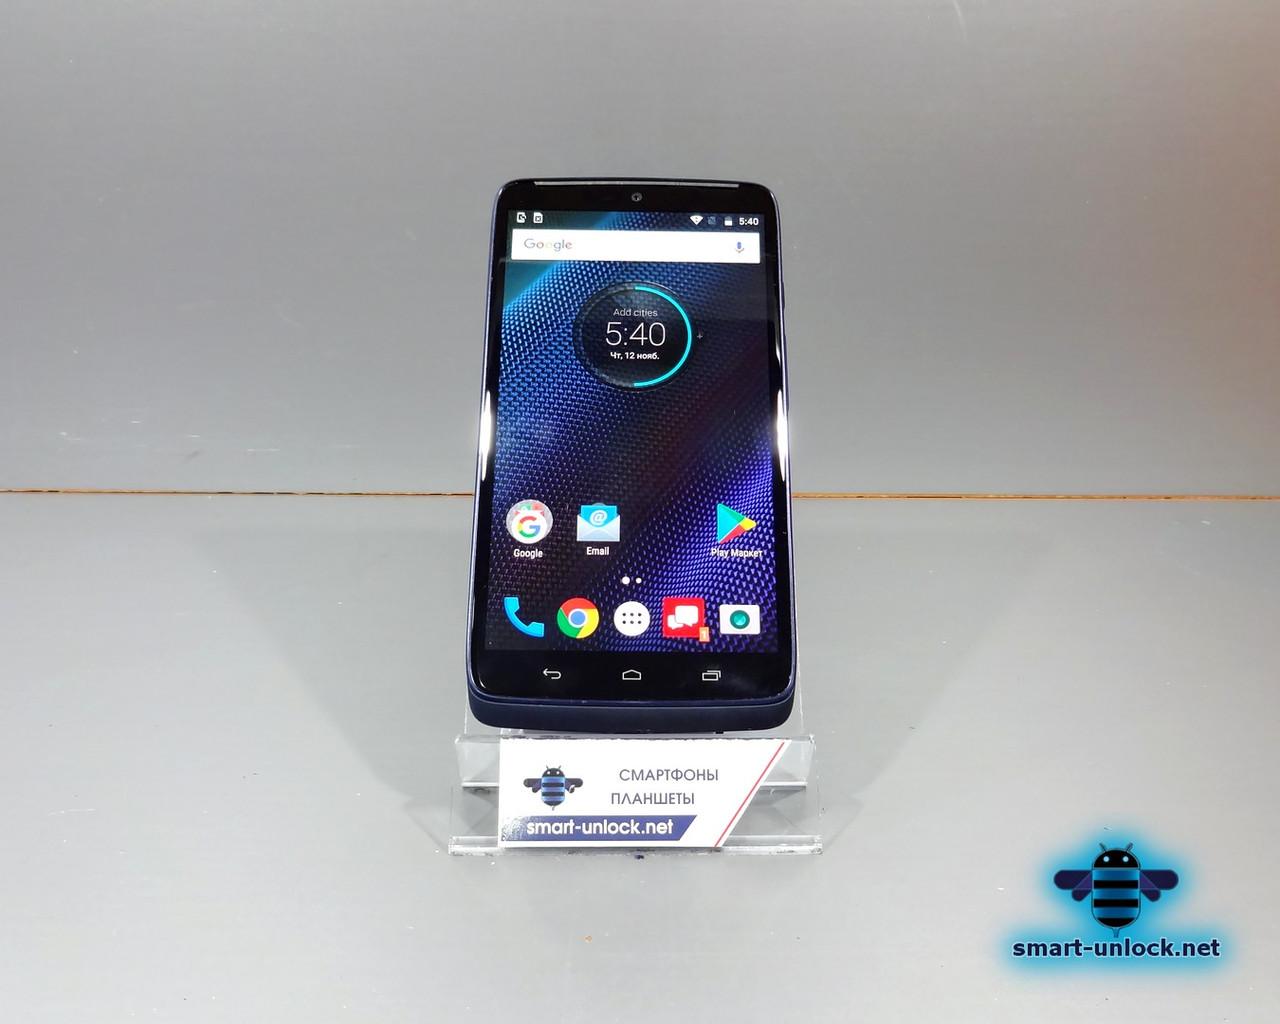 Телефон, смартфон Motorola Droid Turbo Покупка без риска, гарантия!